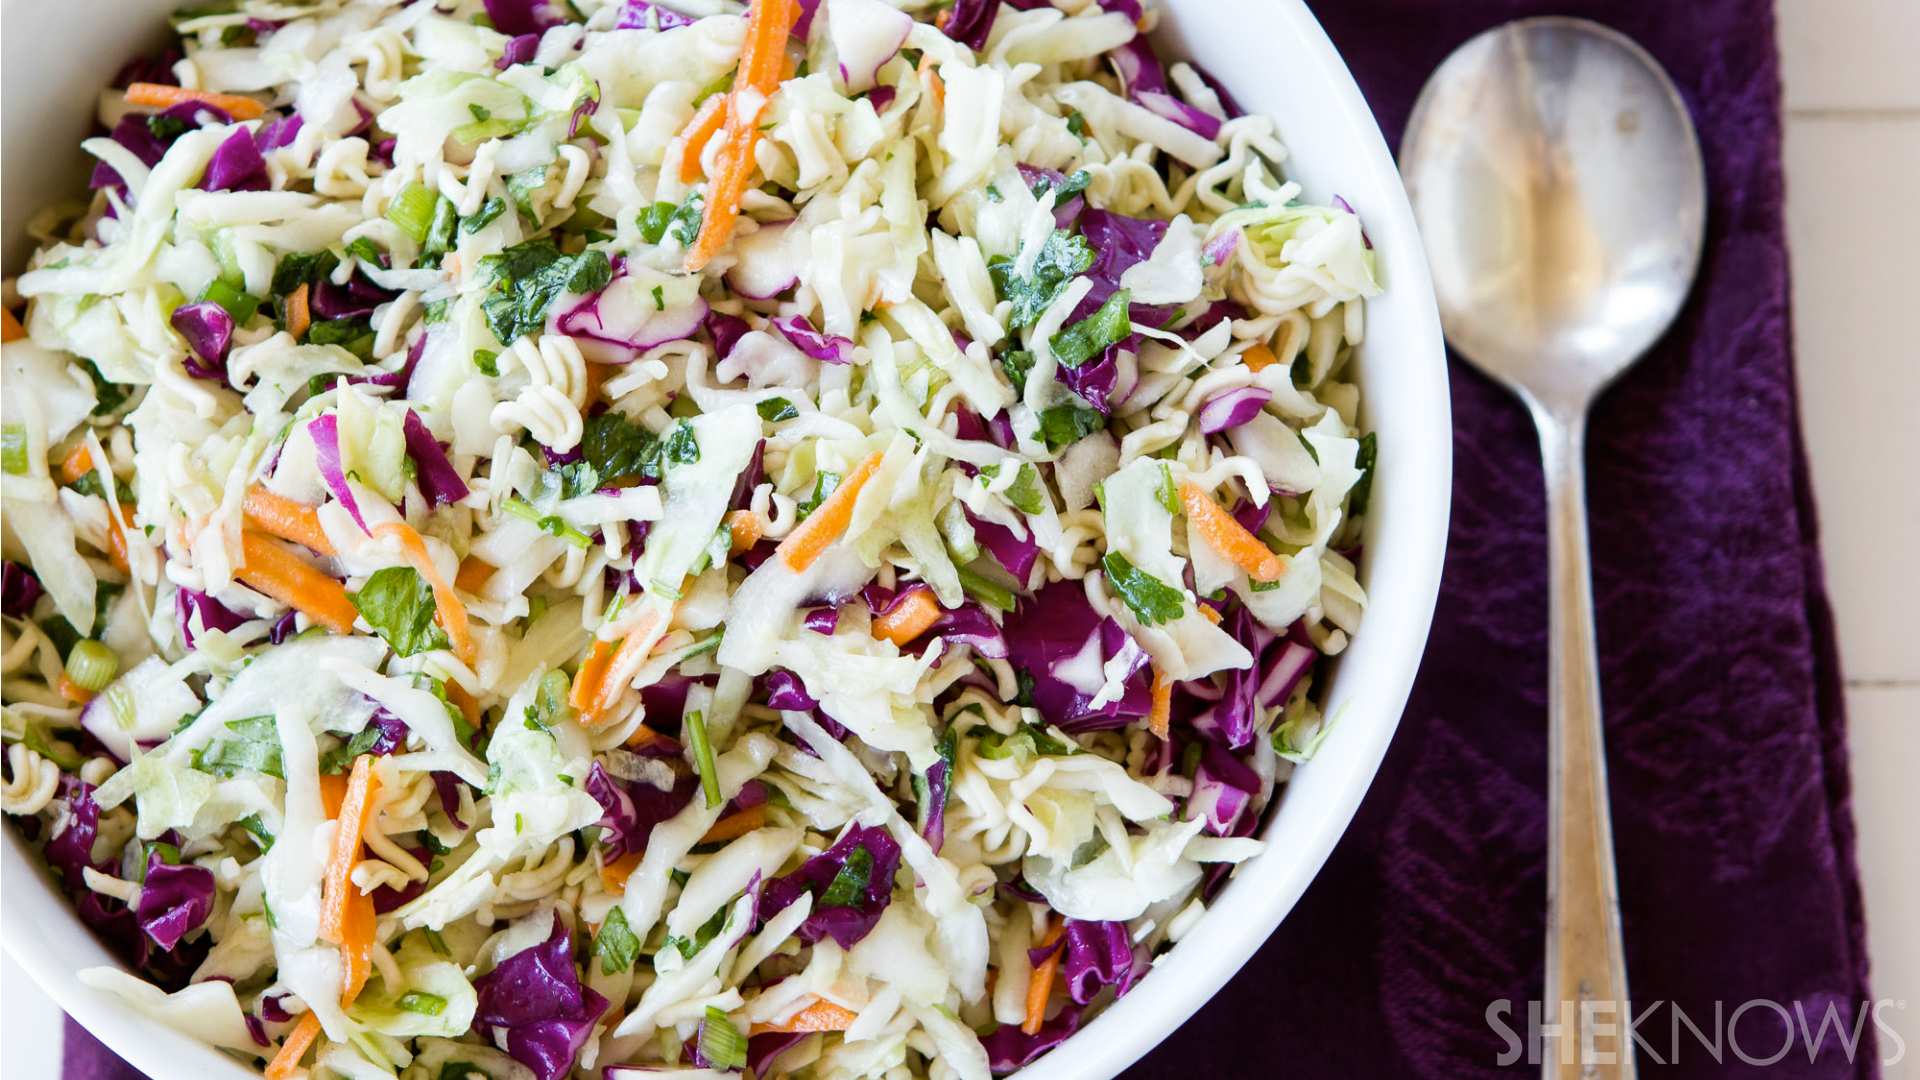 Crunchy coleslaw with ramen noodles